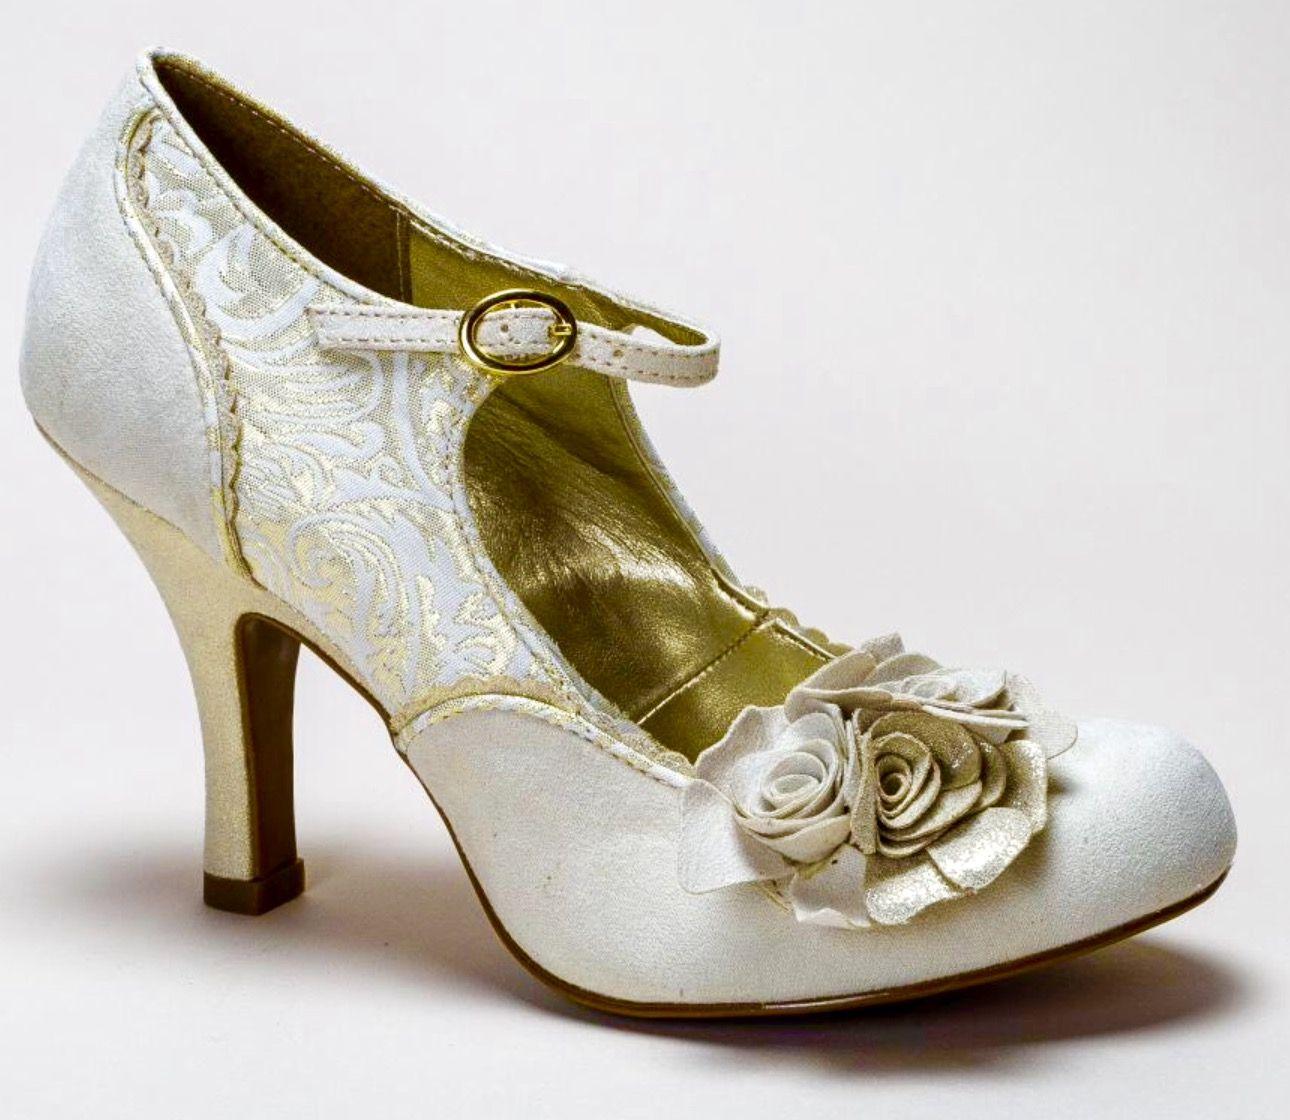 Ruby Shoo Emily, Escarpins Femme - Or - Gold (Cream/Gold), 41 EU (8 UK)